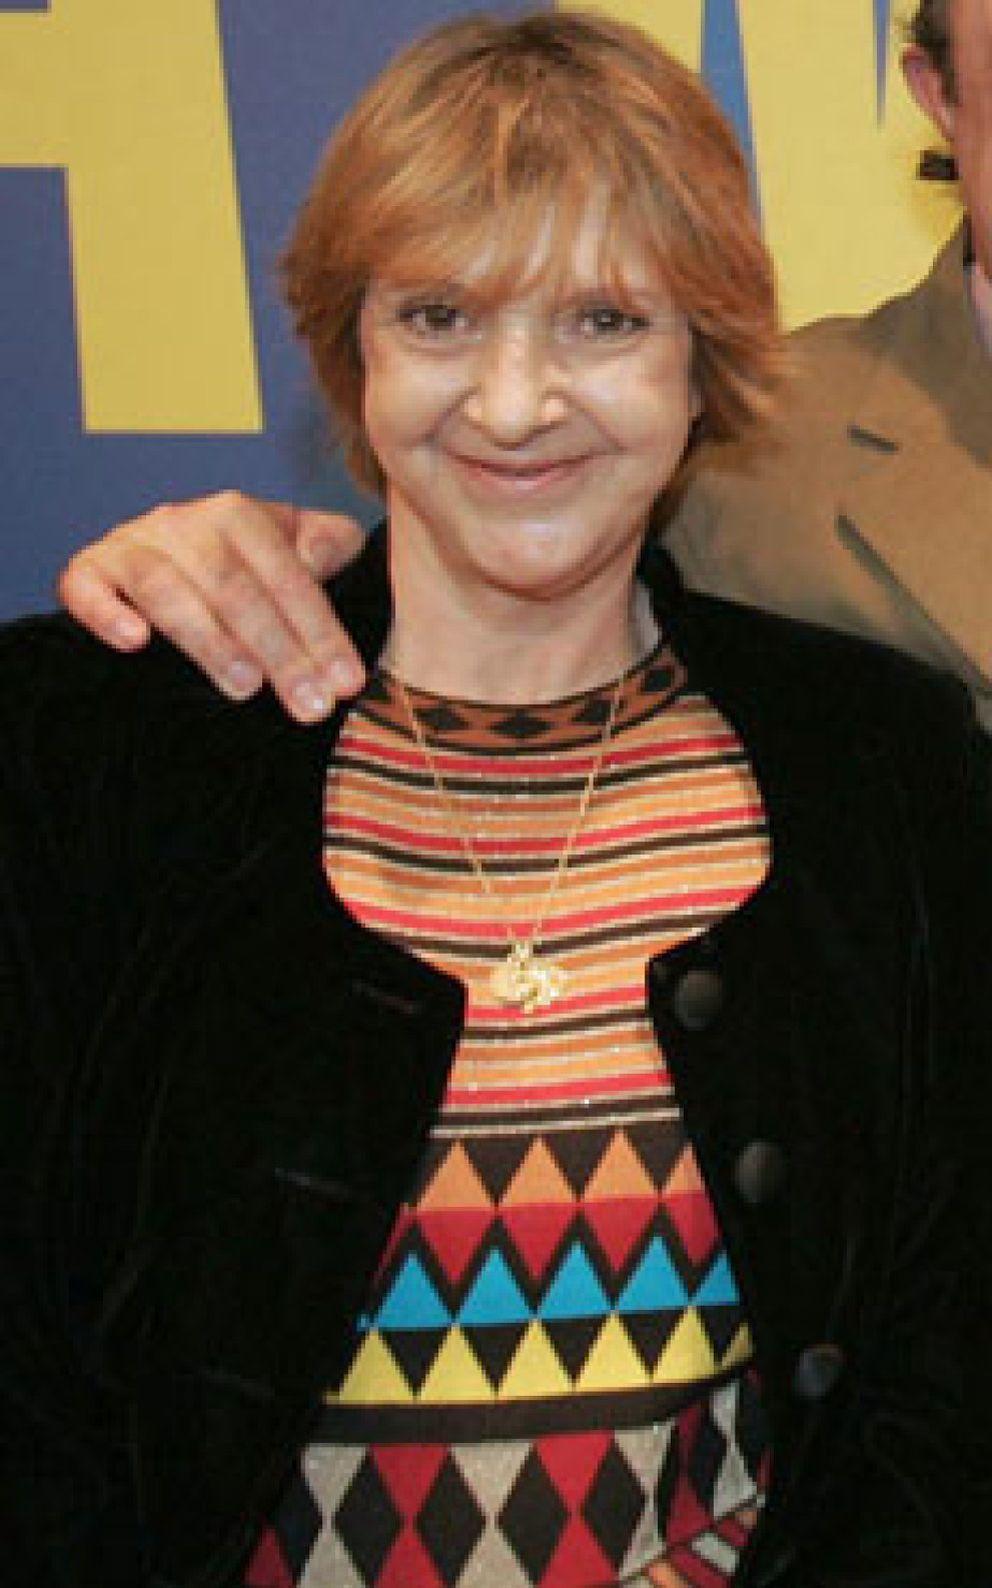 Kika Markham,Anita Bush Porno pics & movies Allyn King,Amy Van Dyken 6 Olympic medals